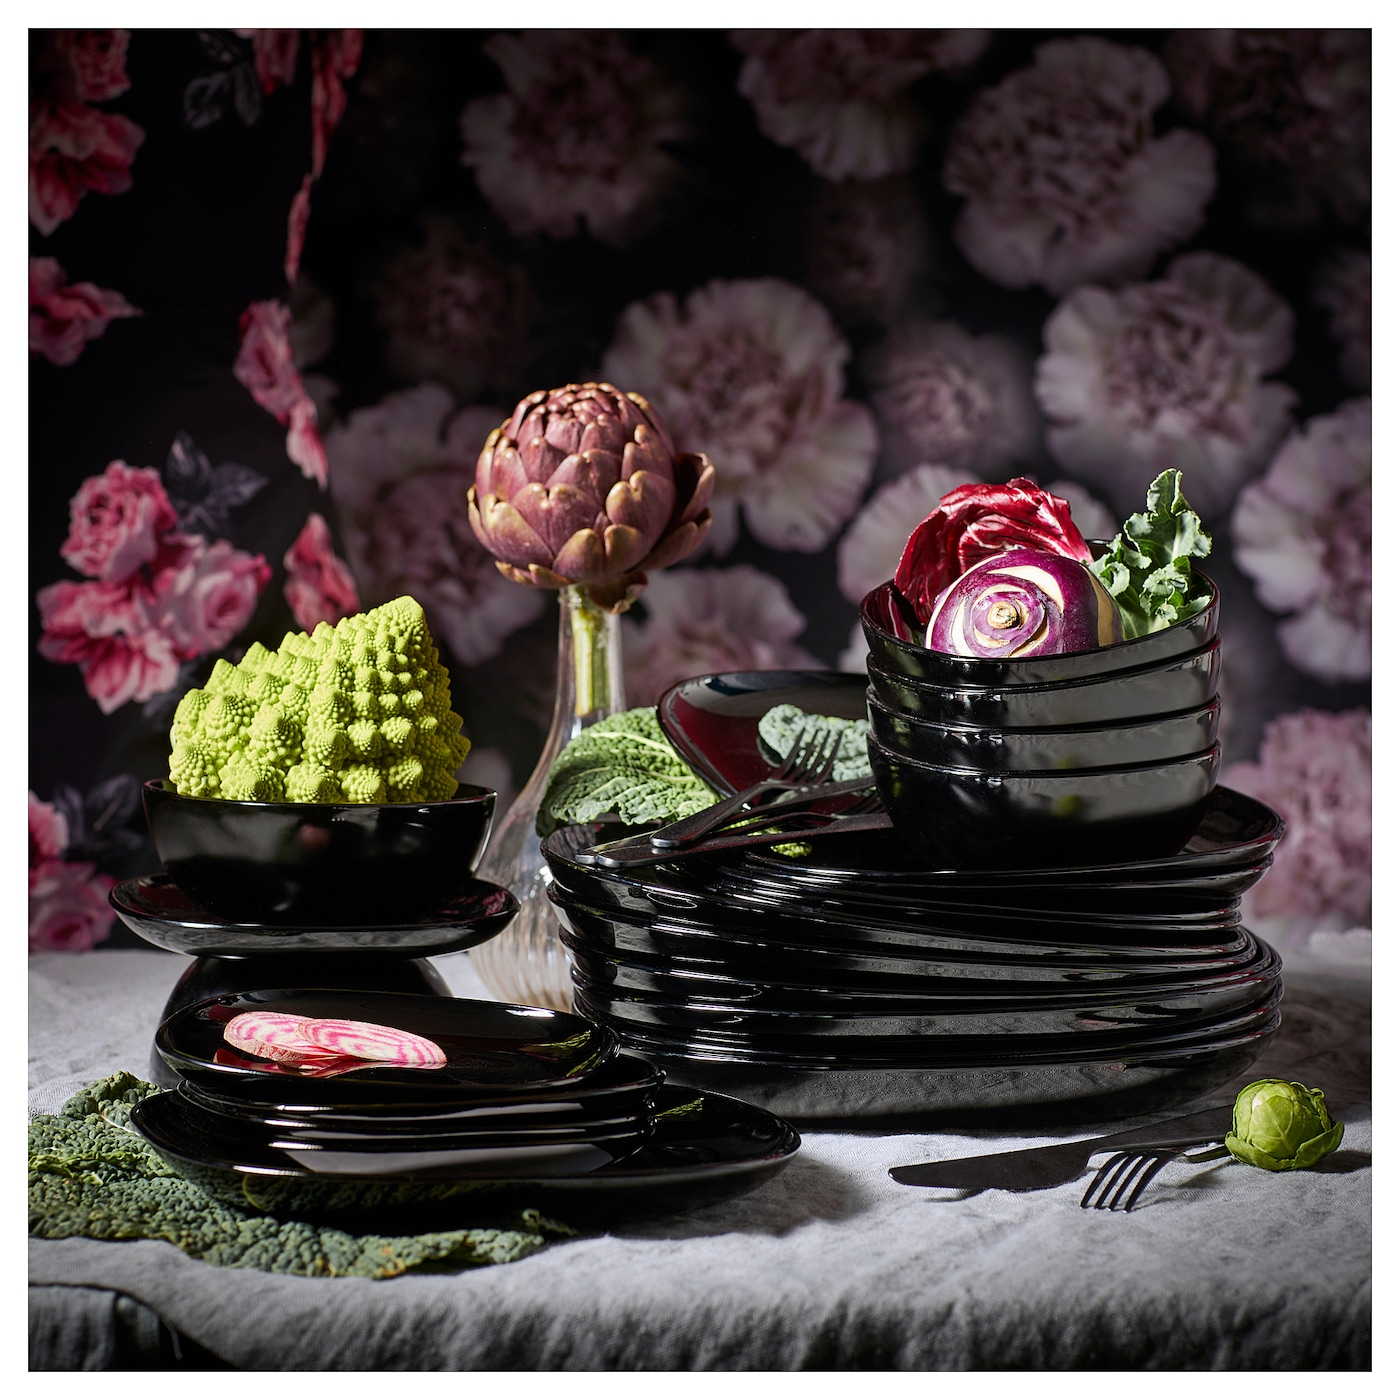 Dinner Set Dinnerware Square Black Plate Bowl Tableware 12 18 Pc Ikea Backig